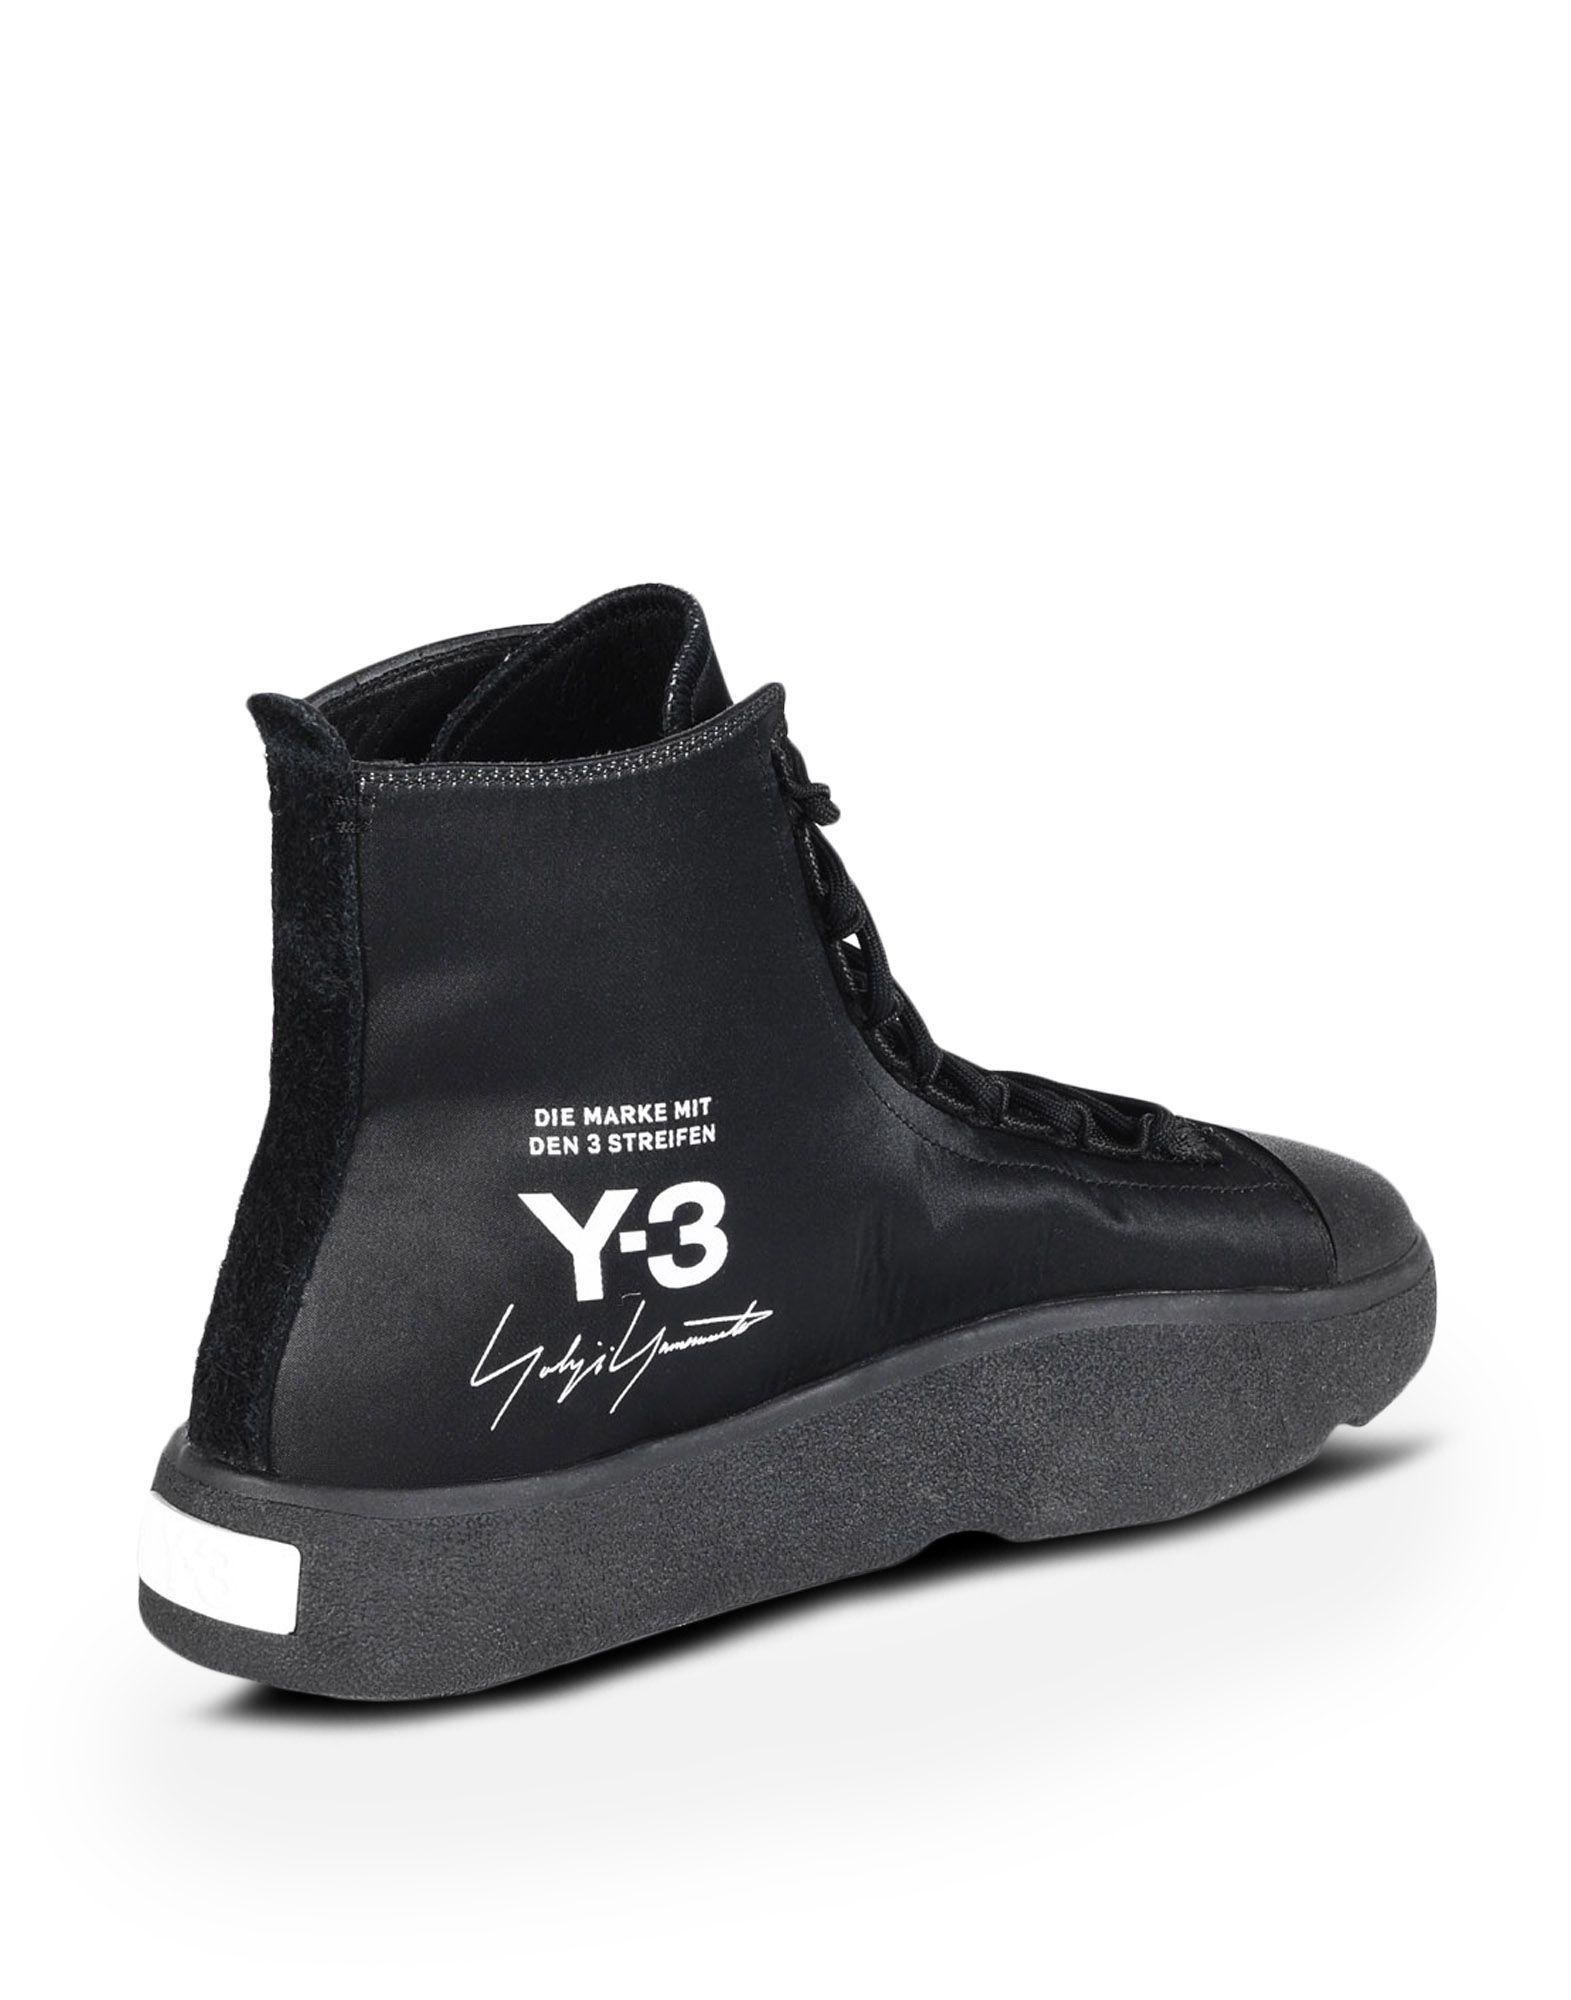 c3021cf42e Y-3 BASHYO SHOES unisex Y-3 adidas | sneakers | Sapatos, Acessórios ...